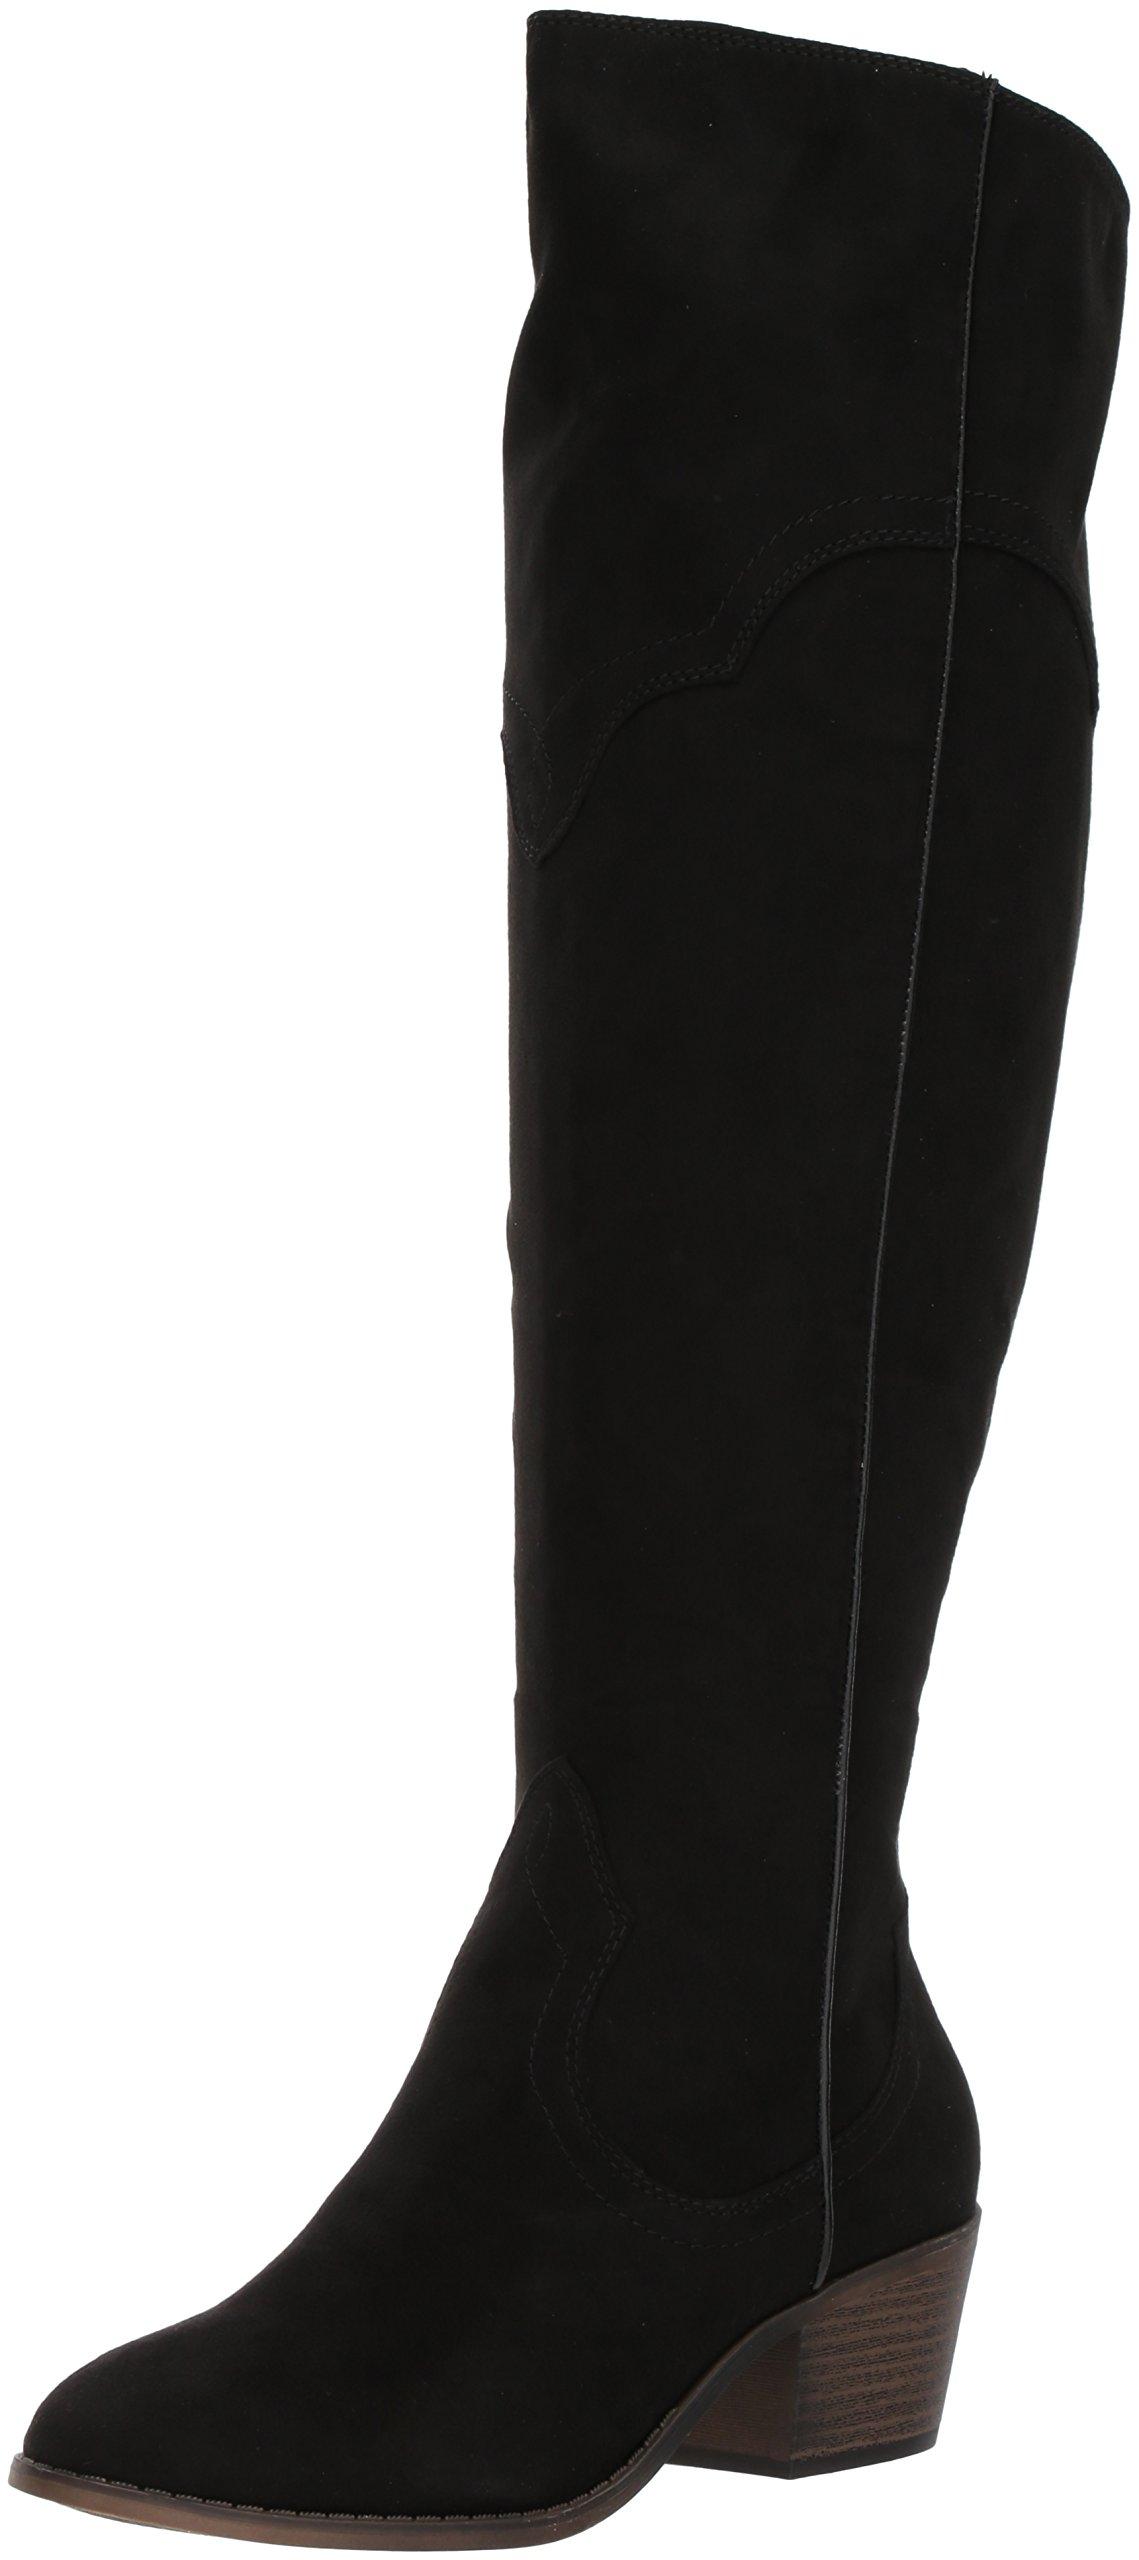 Fergalicious Women's Bata Wide Calf Western Boot